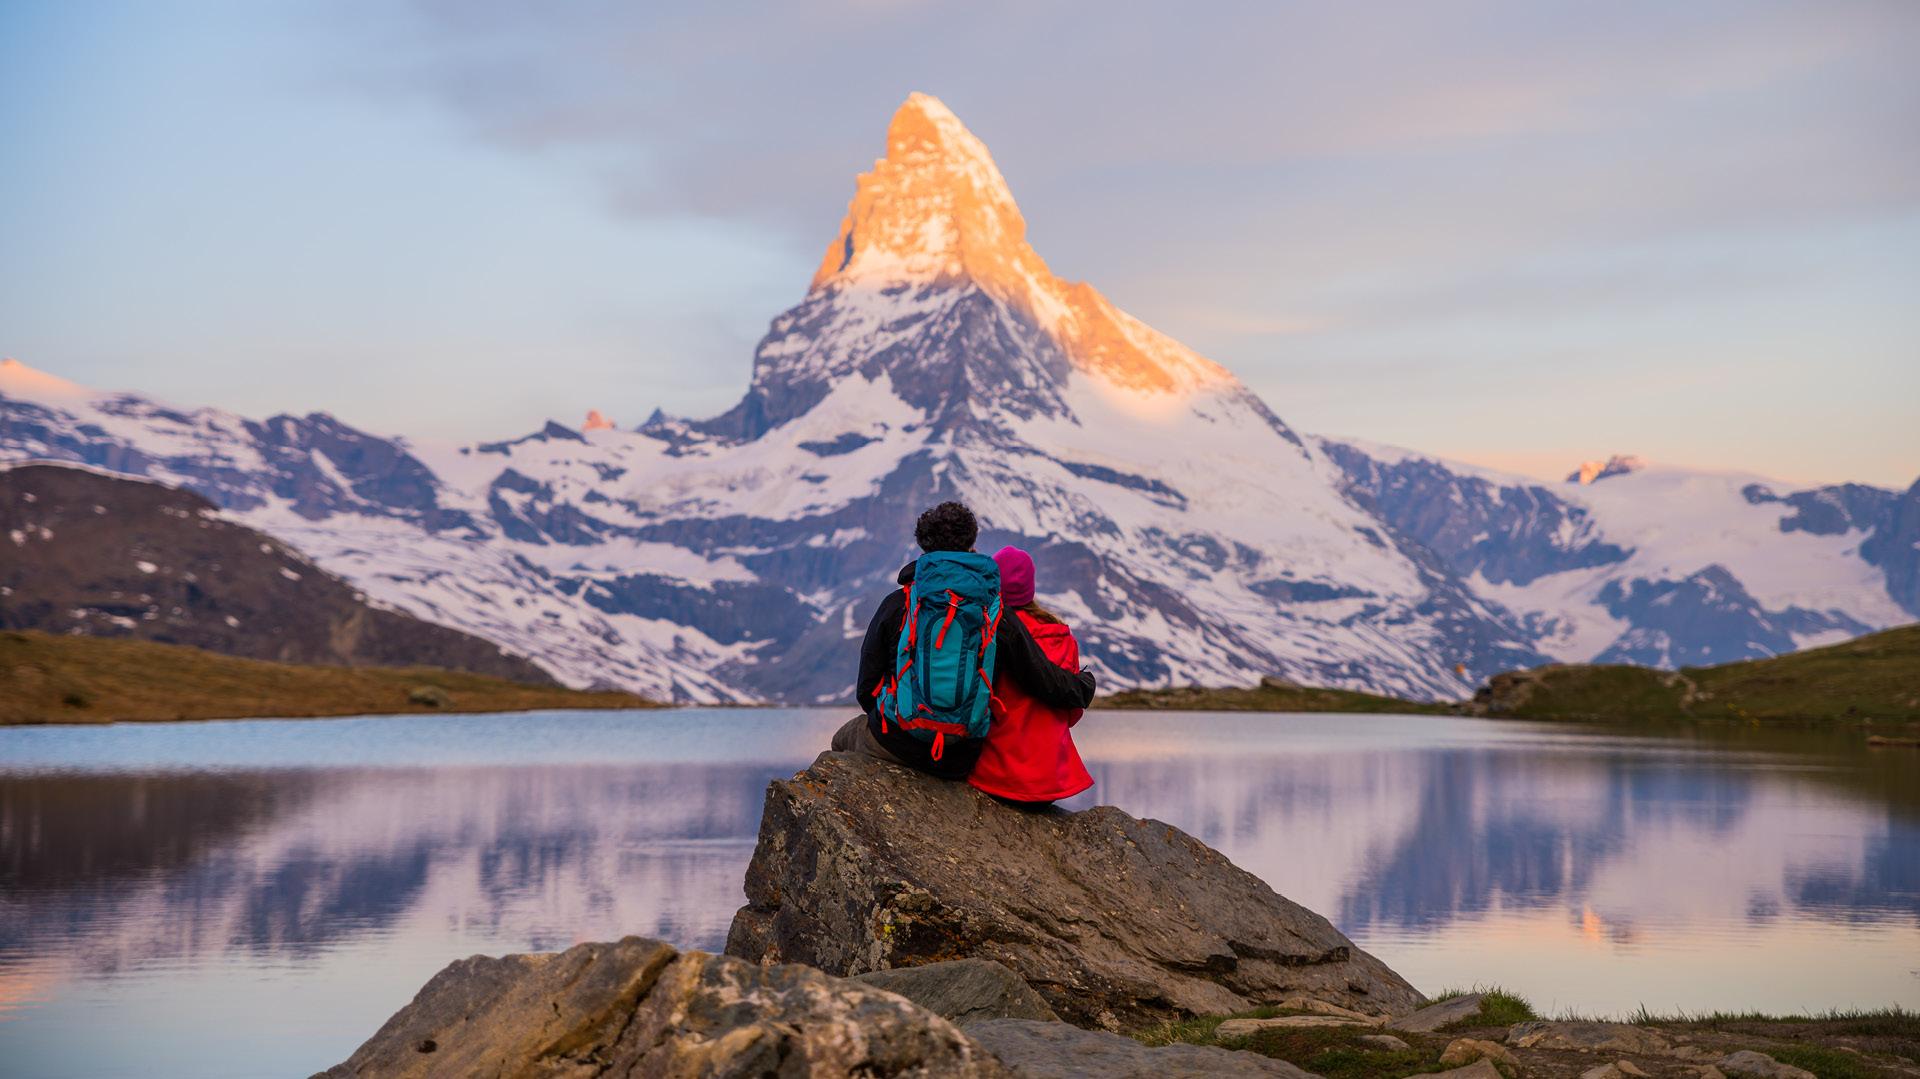 7 Luxurious Honeymoon Destinations Hotels: 7 Luxury Honeymoon Destinations For The Mountain-Loving Couple